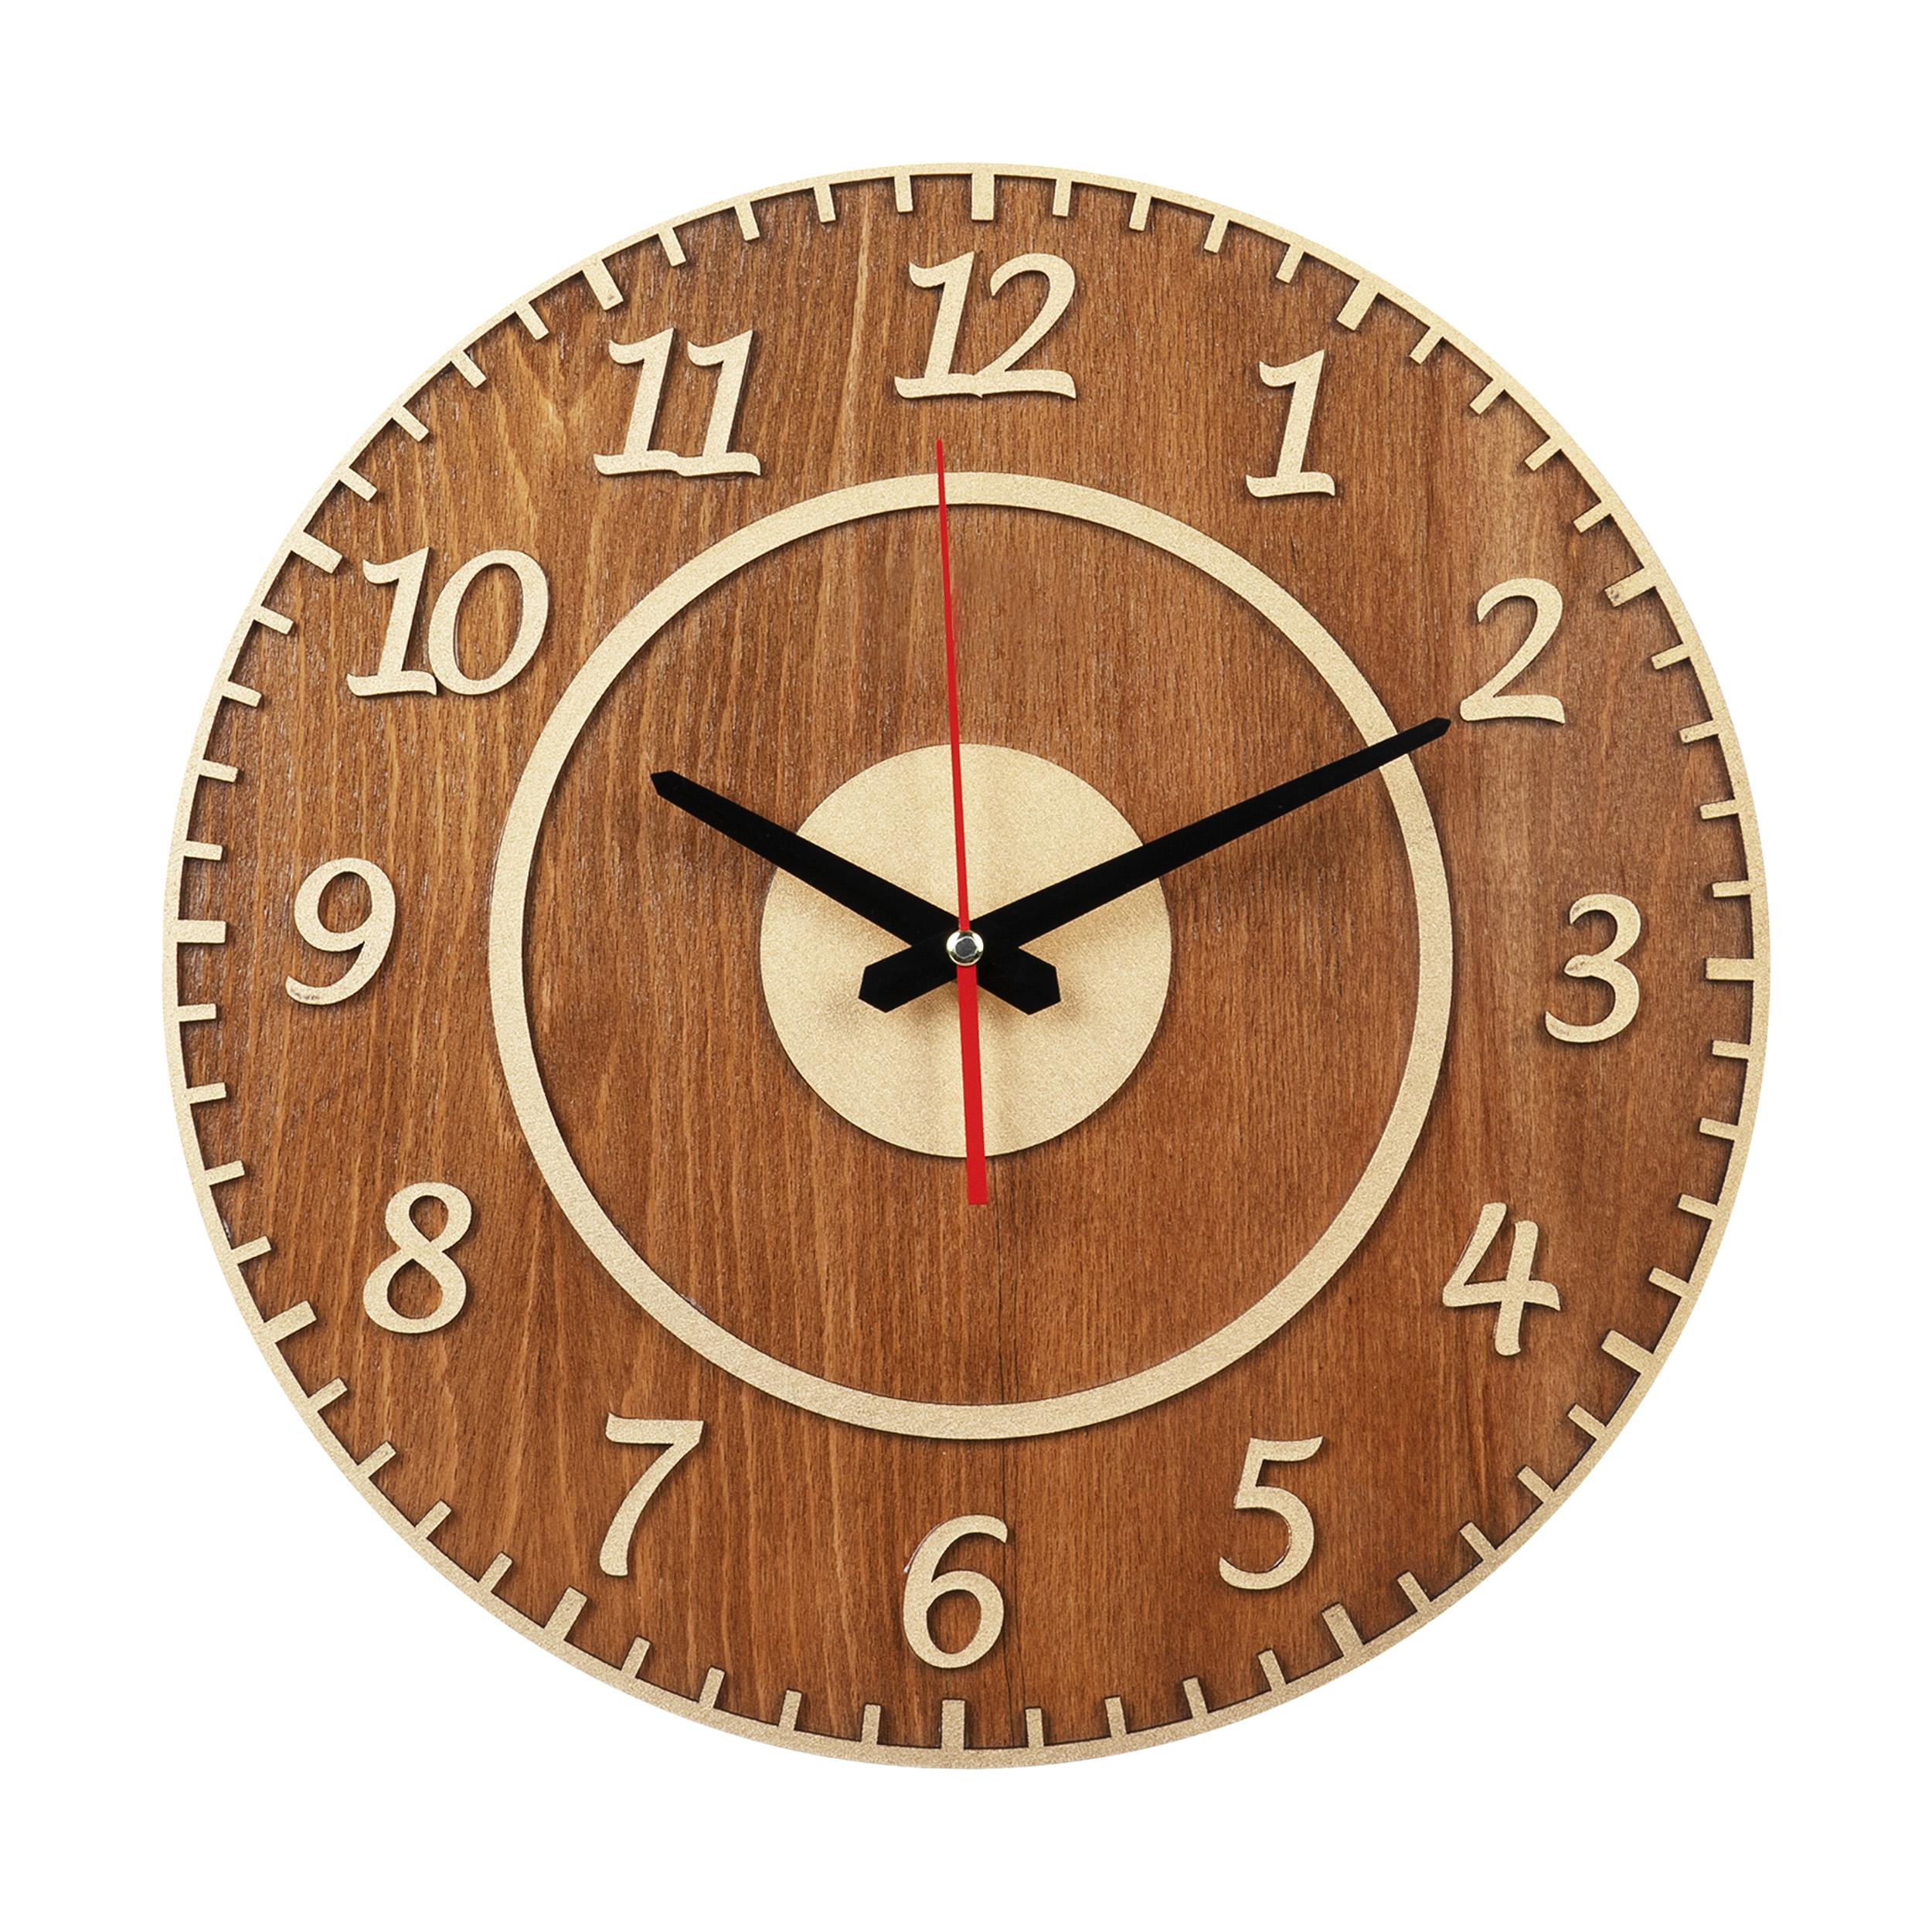 ساعت دیواری معرق کاری هُم آدیس مدل KITA کد CK 608-TC